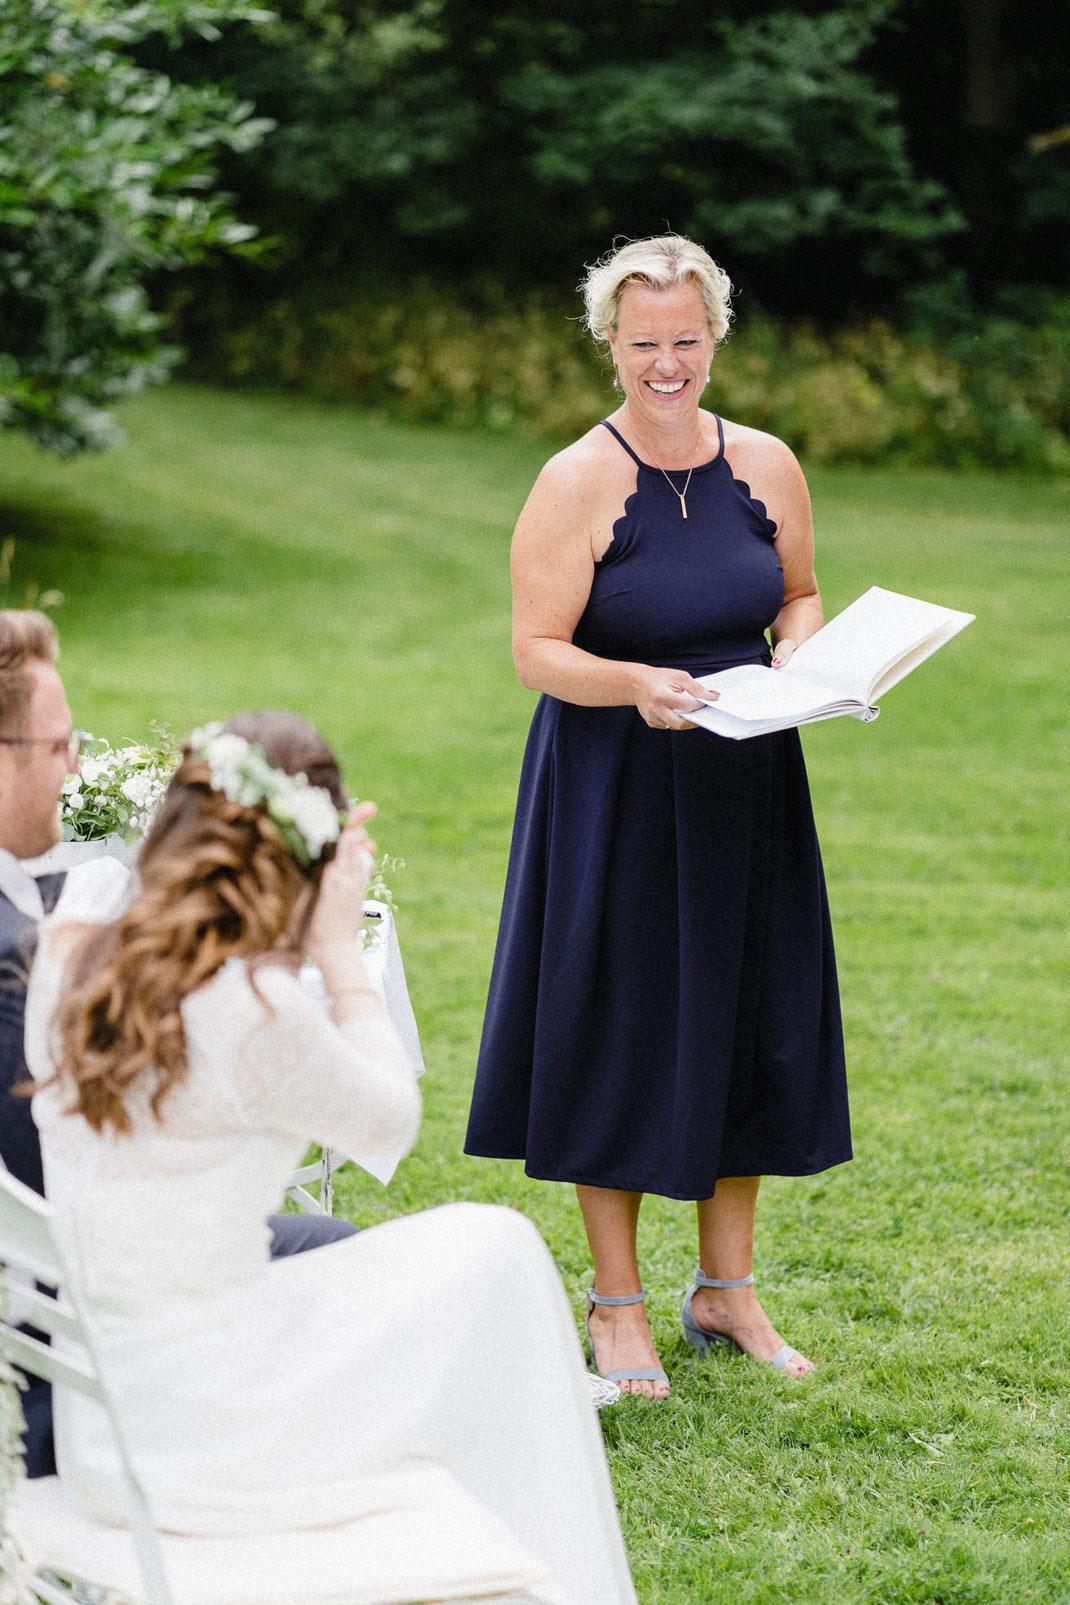 Lachen Blond Rede Kleid Blau Skript